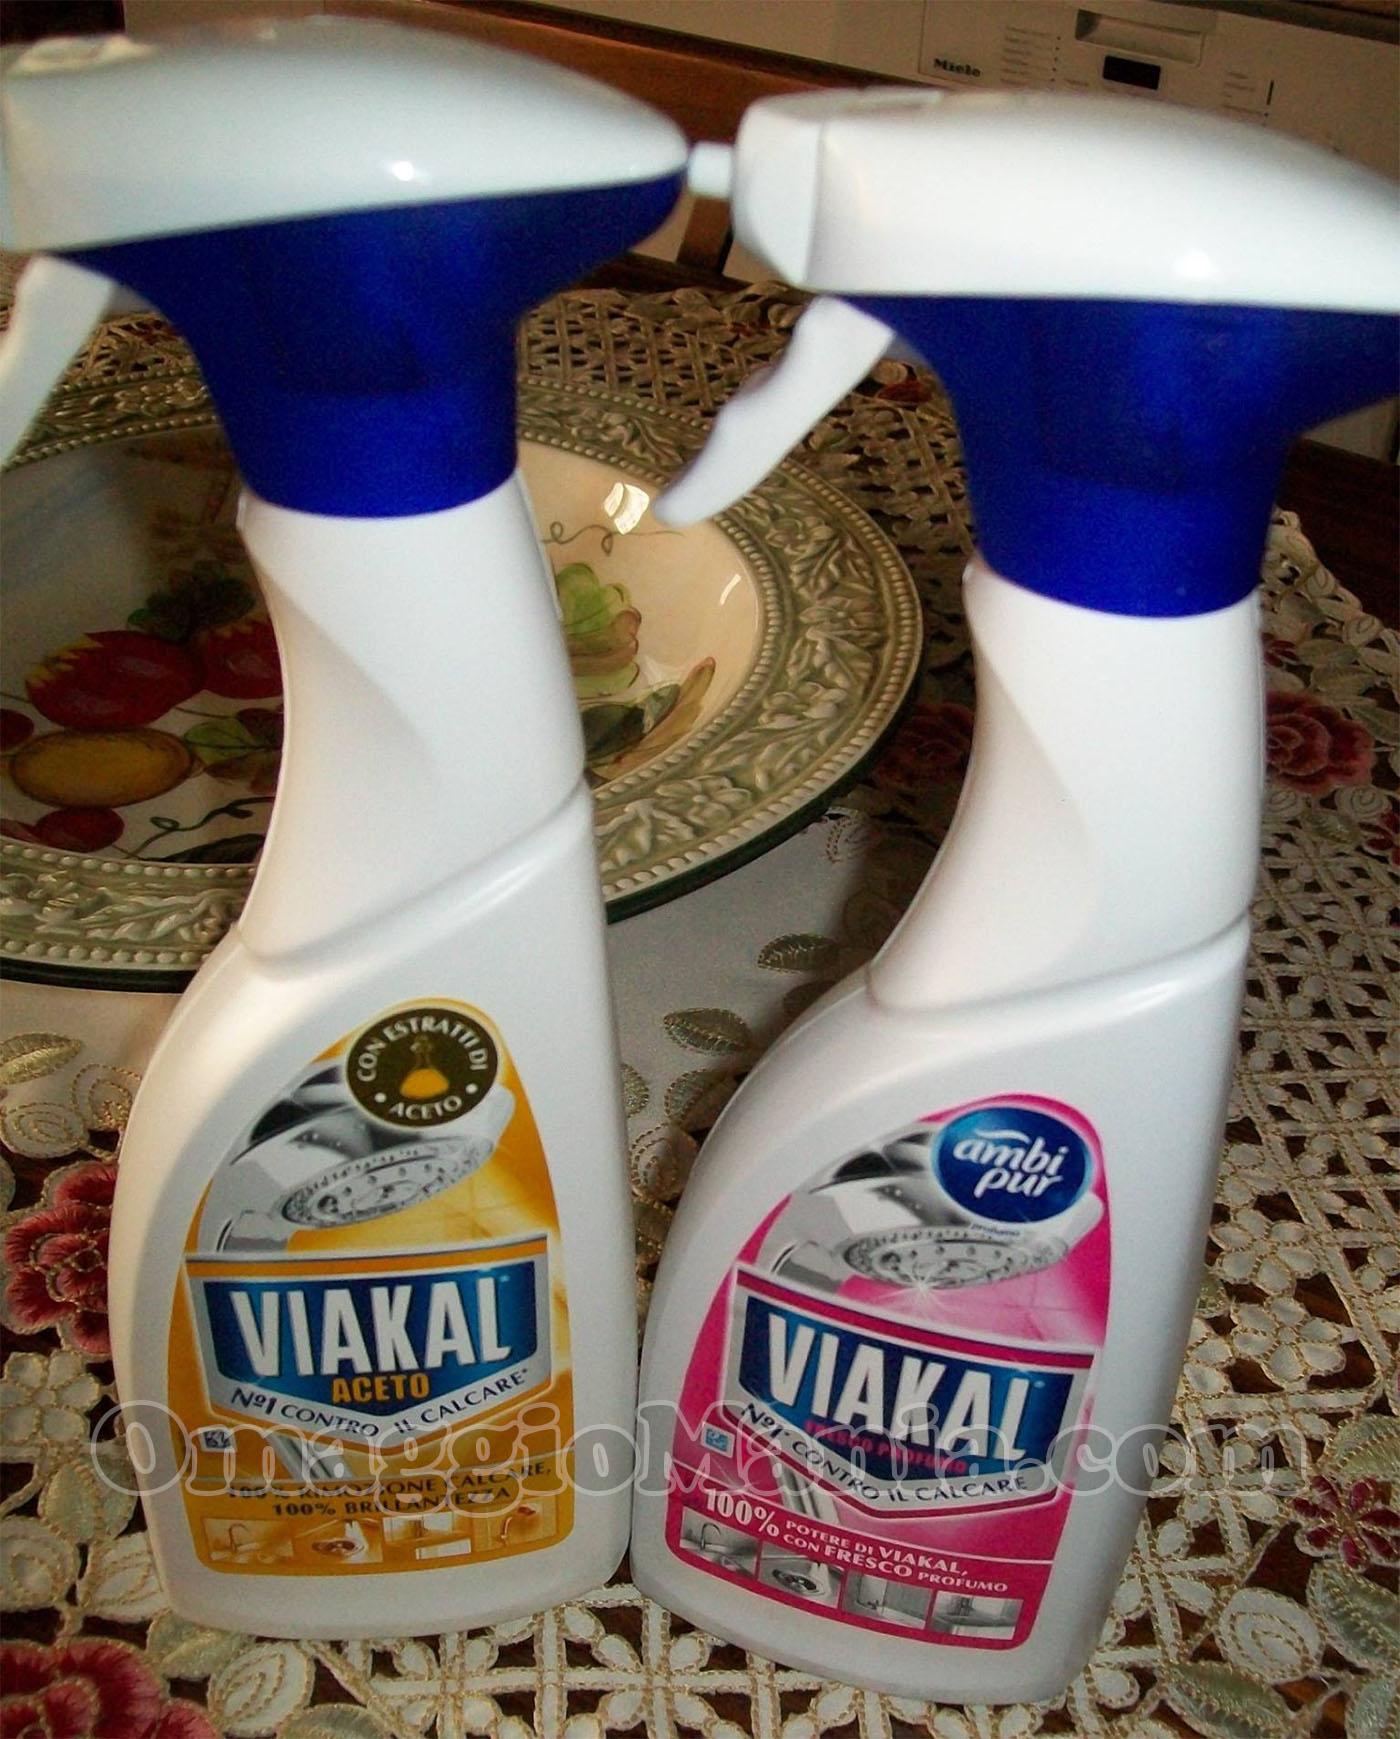 kit Viakal Spray di Elisa